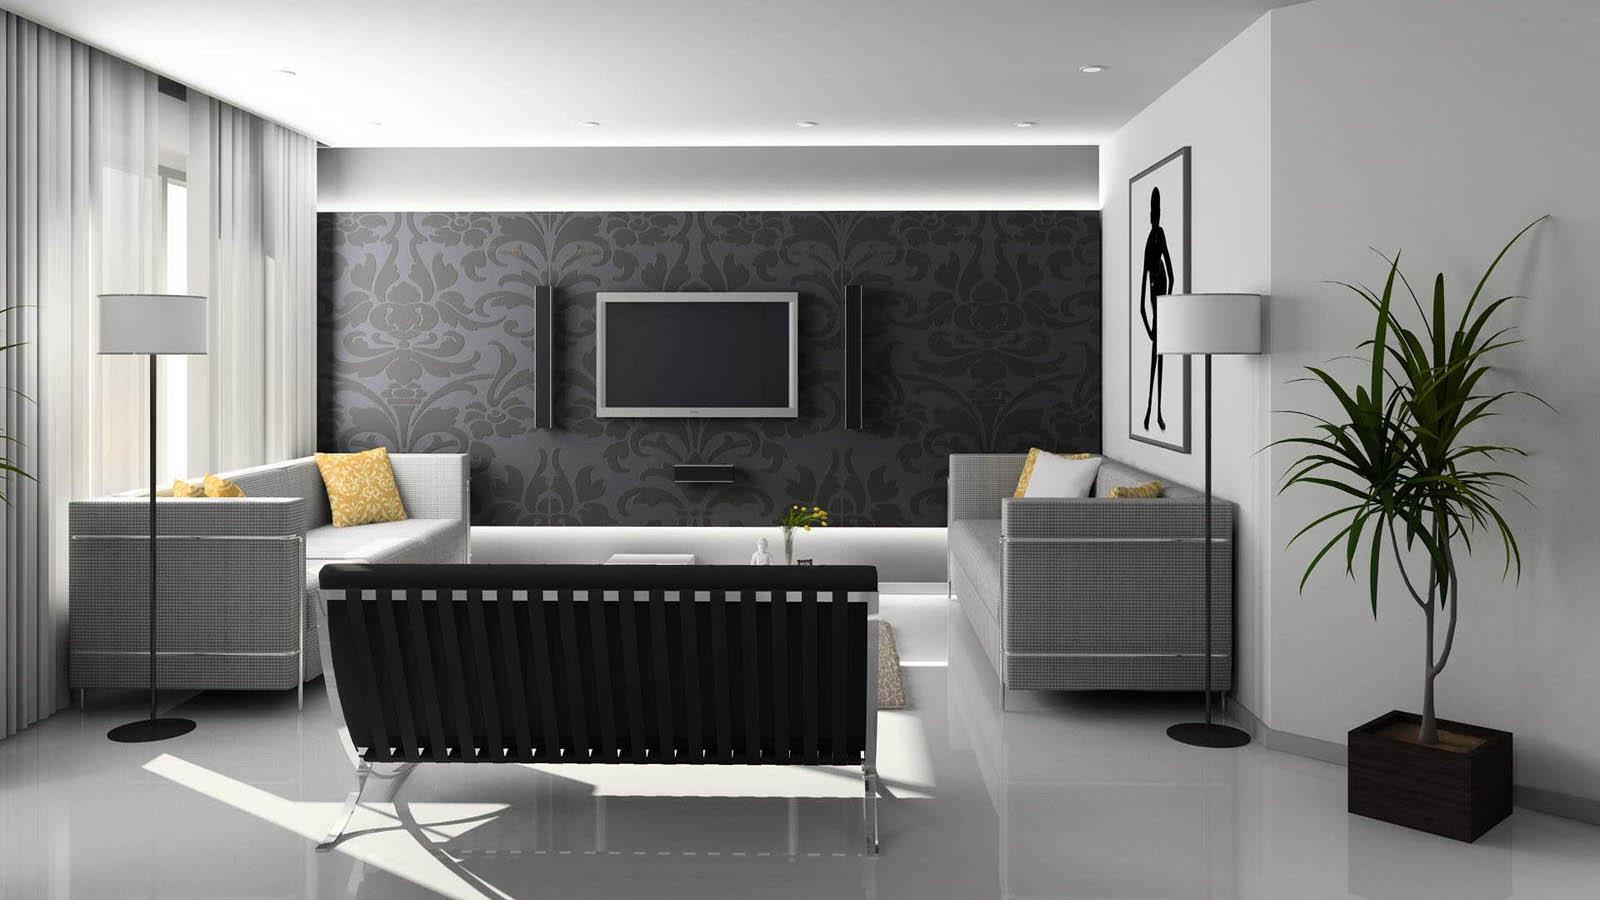 House design hd wallpaper - House Design Hd Wallpaper 55